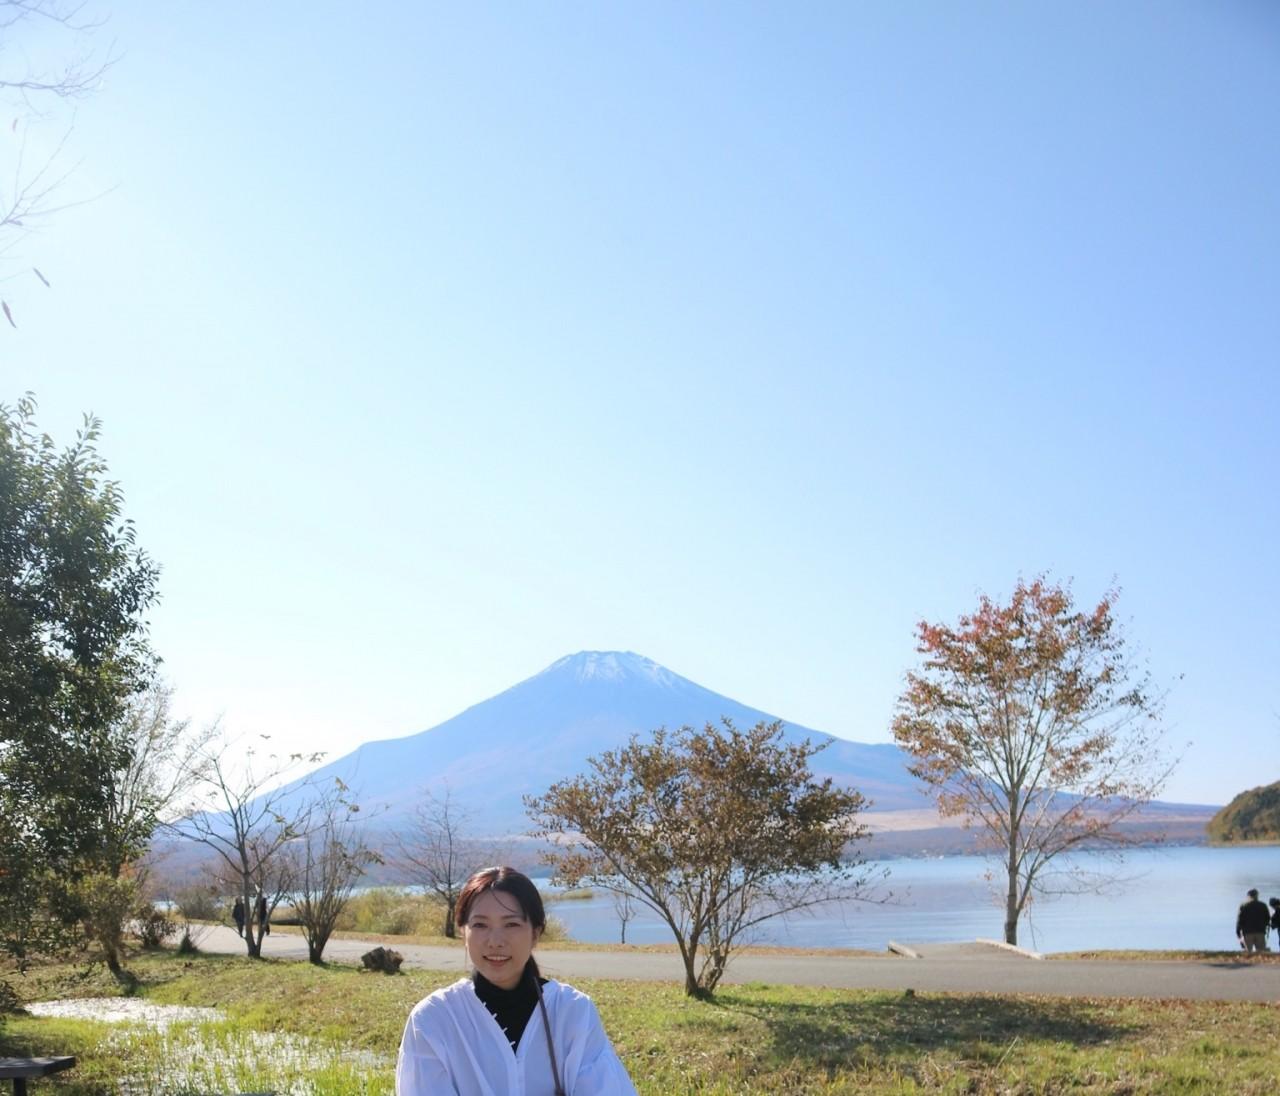 Go to トラベルで富士山を眺めに♪ 観光編